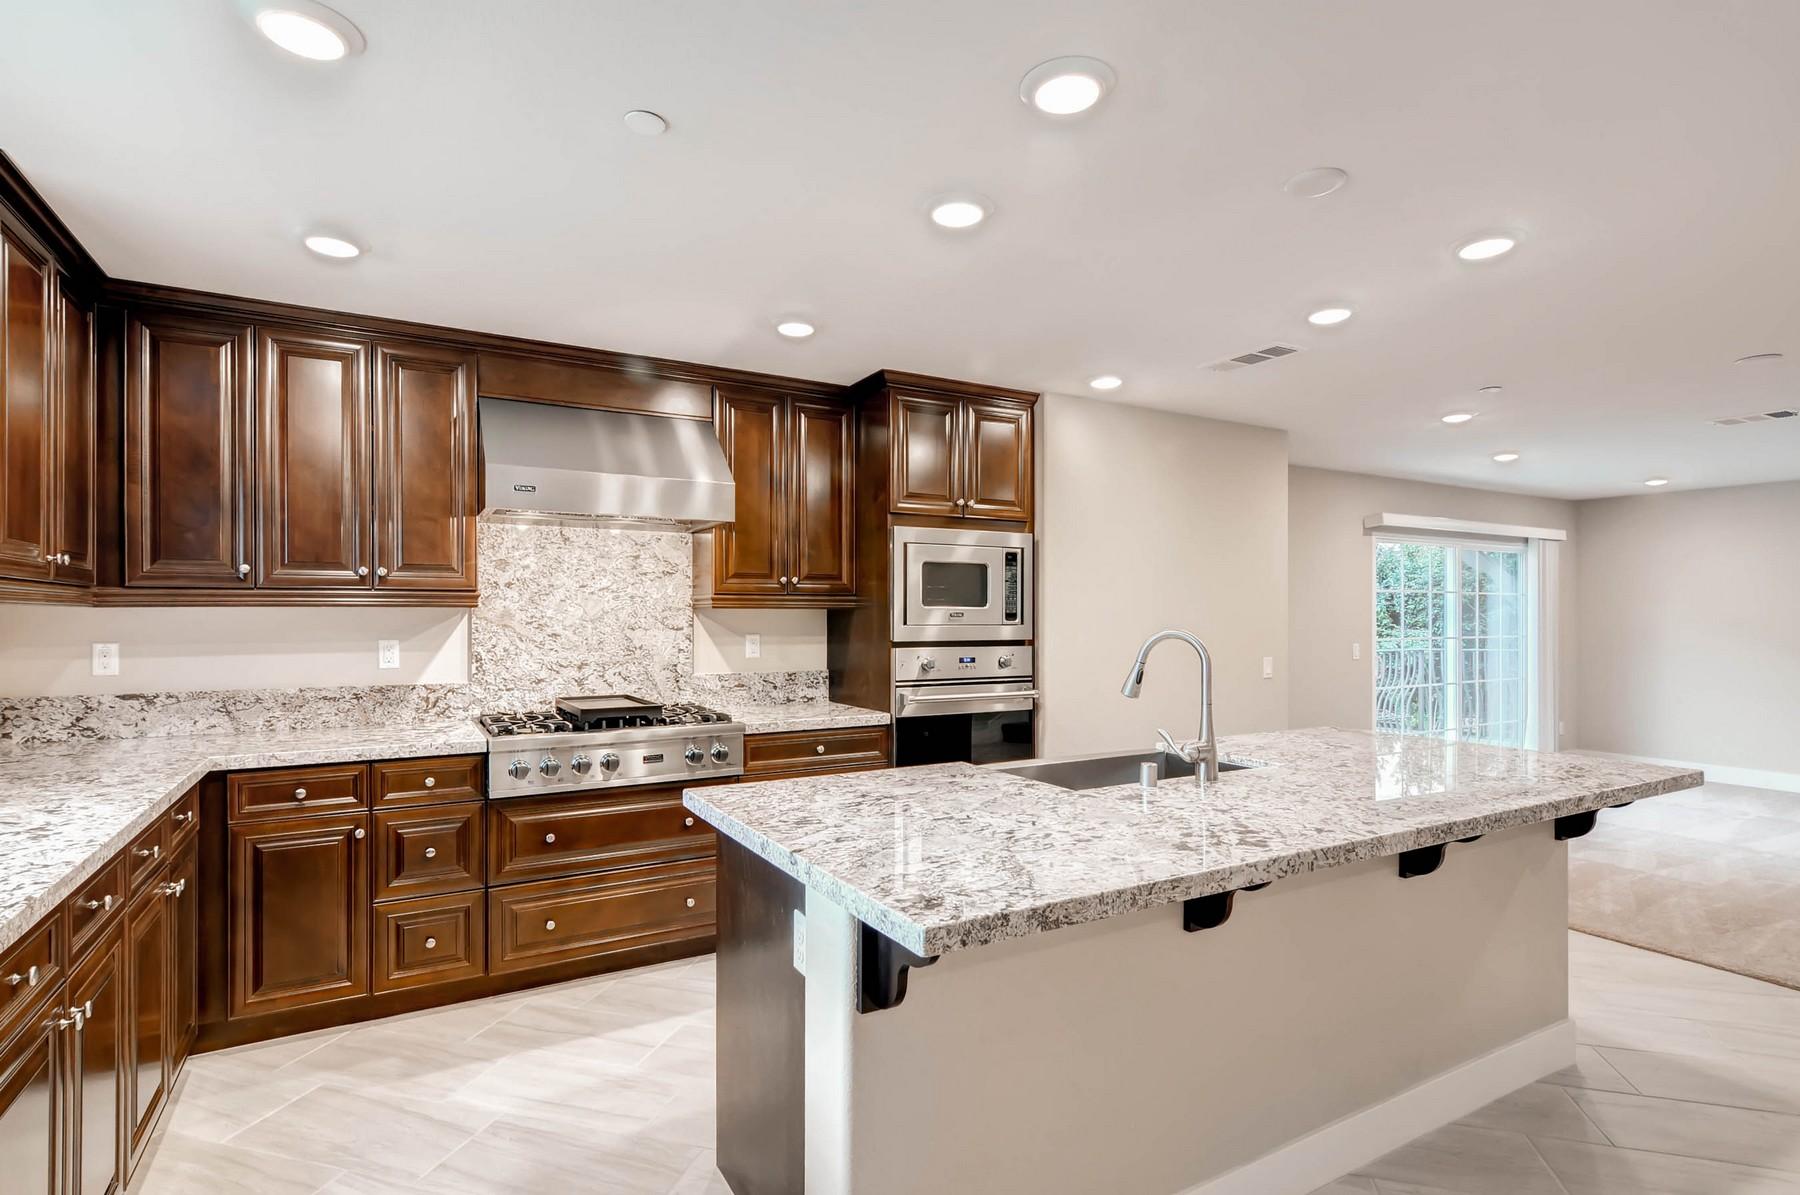 rentals property at 2408 Torrey Pines Rd